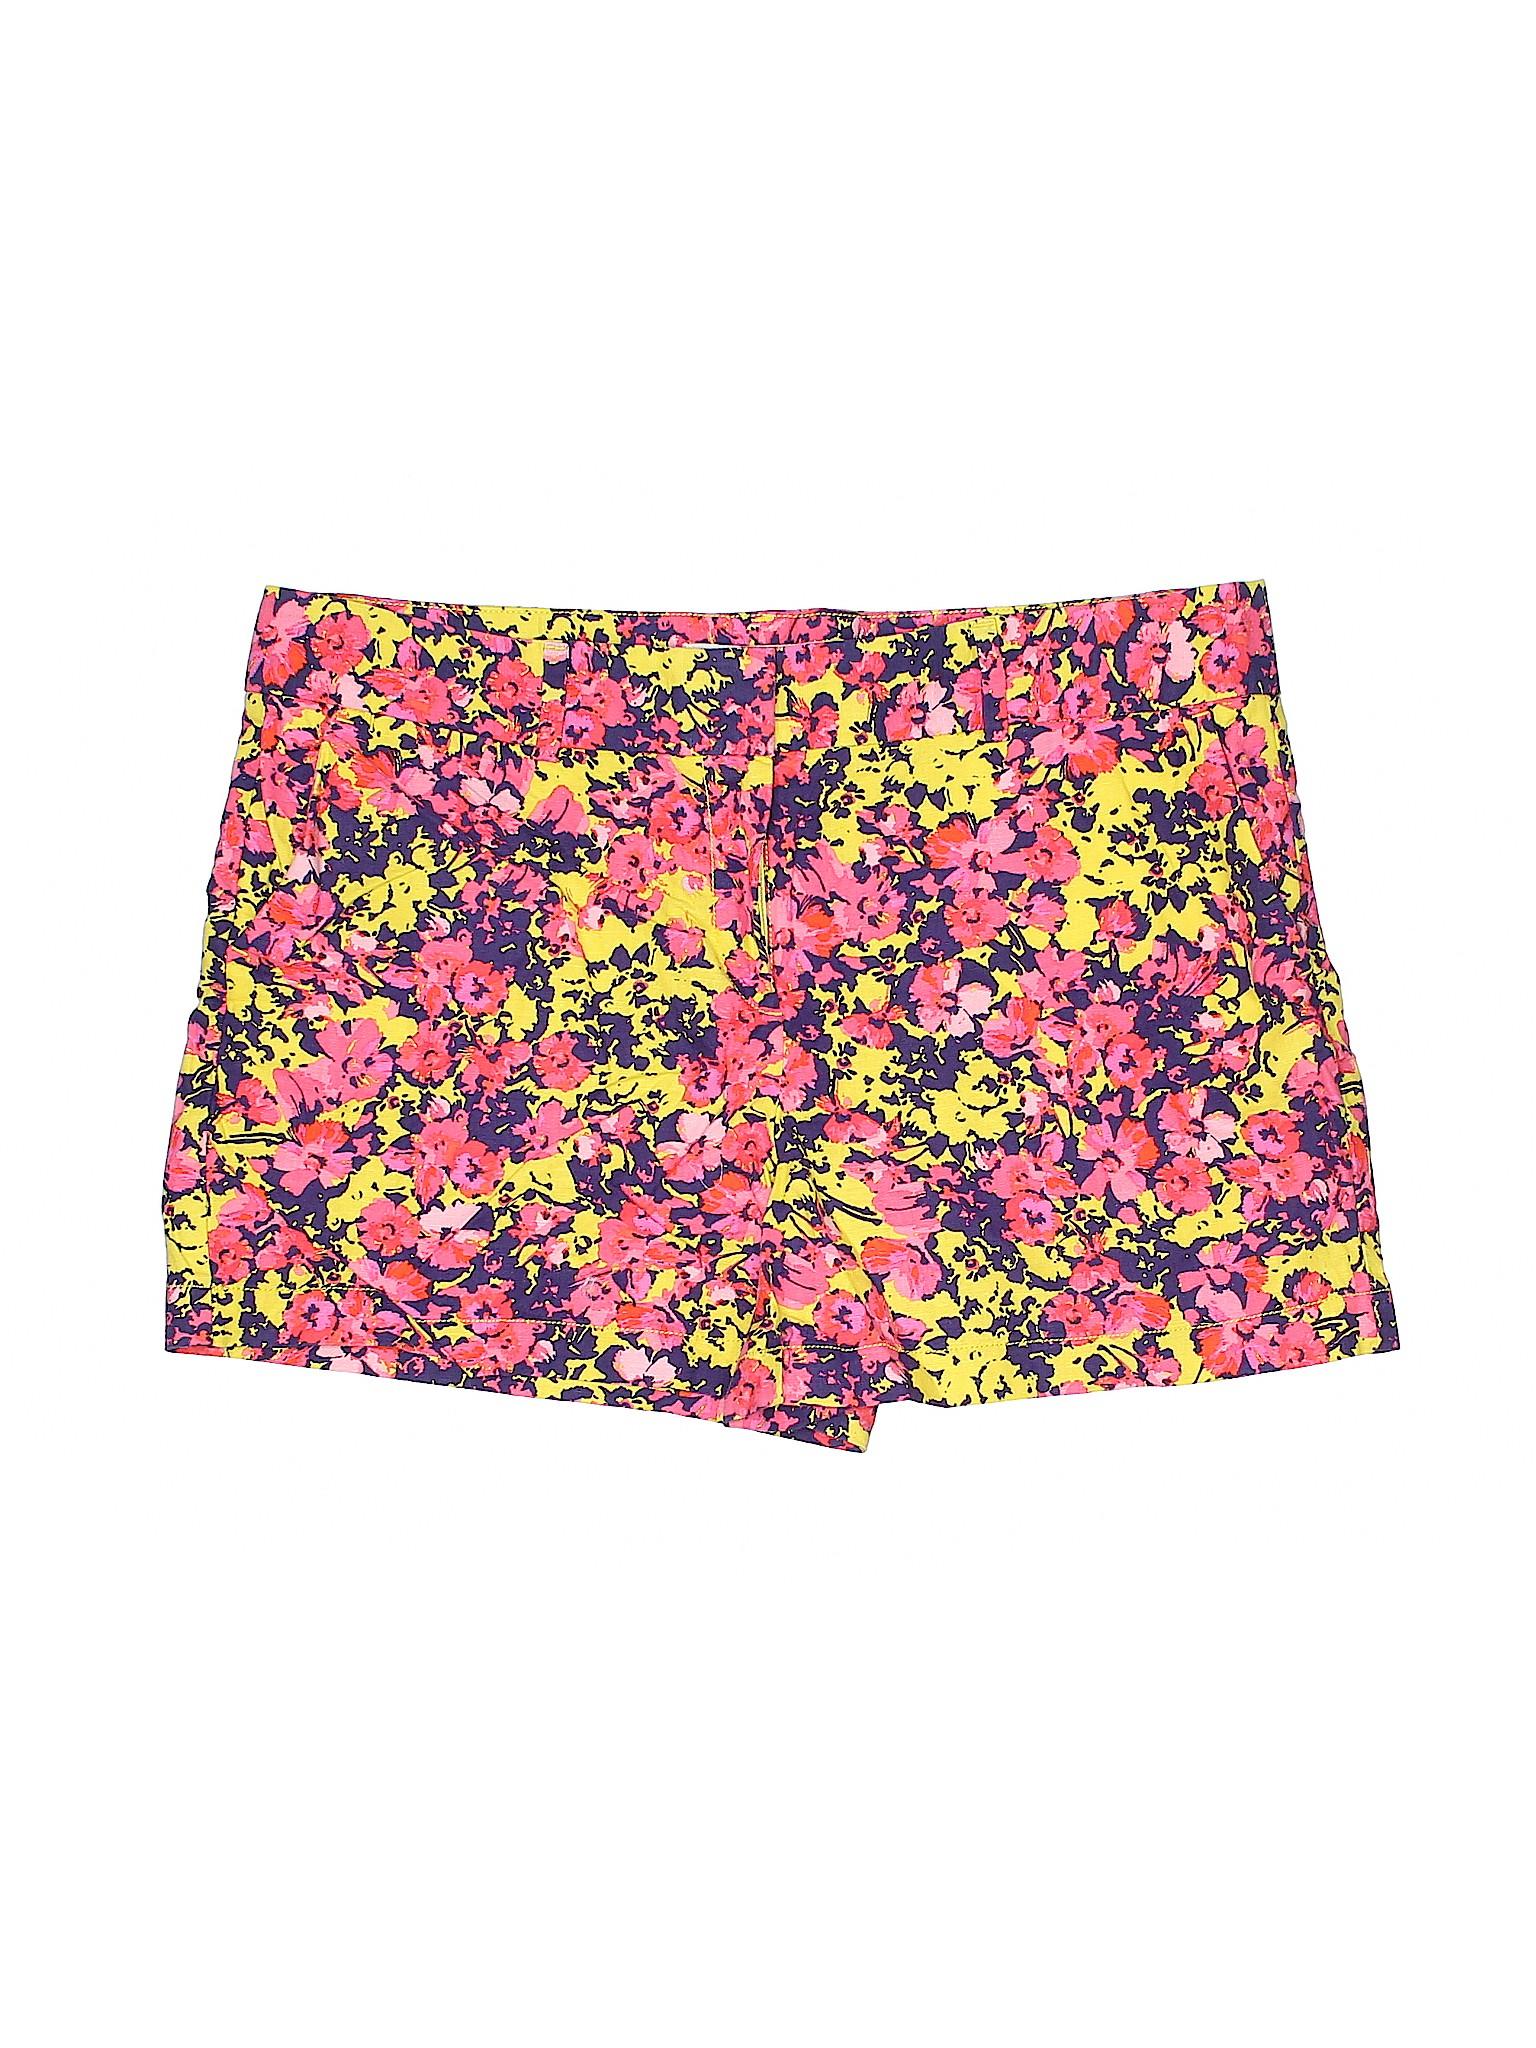 Taylor Shorts Khaki LOFT Ann Boutique vfOx0TqwO